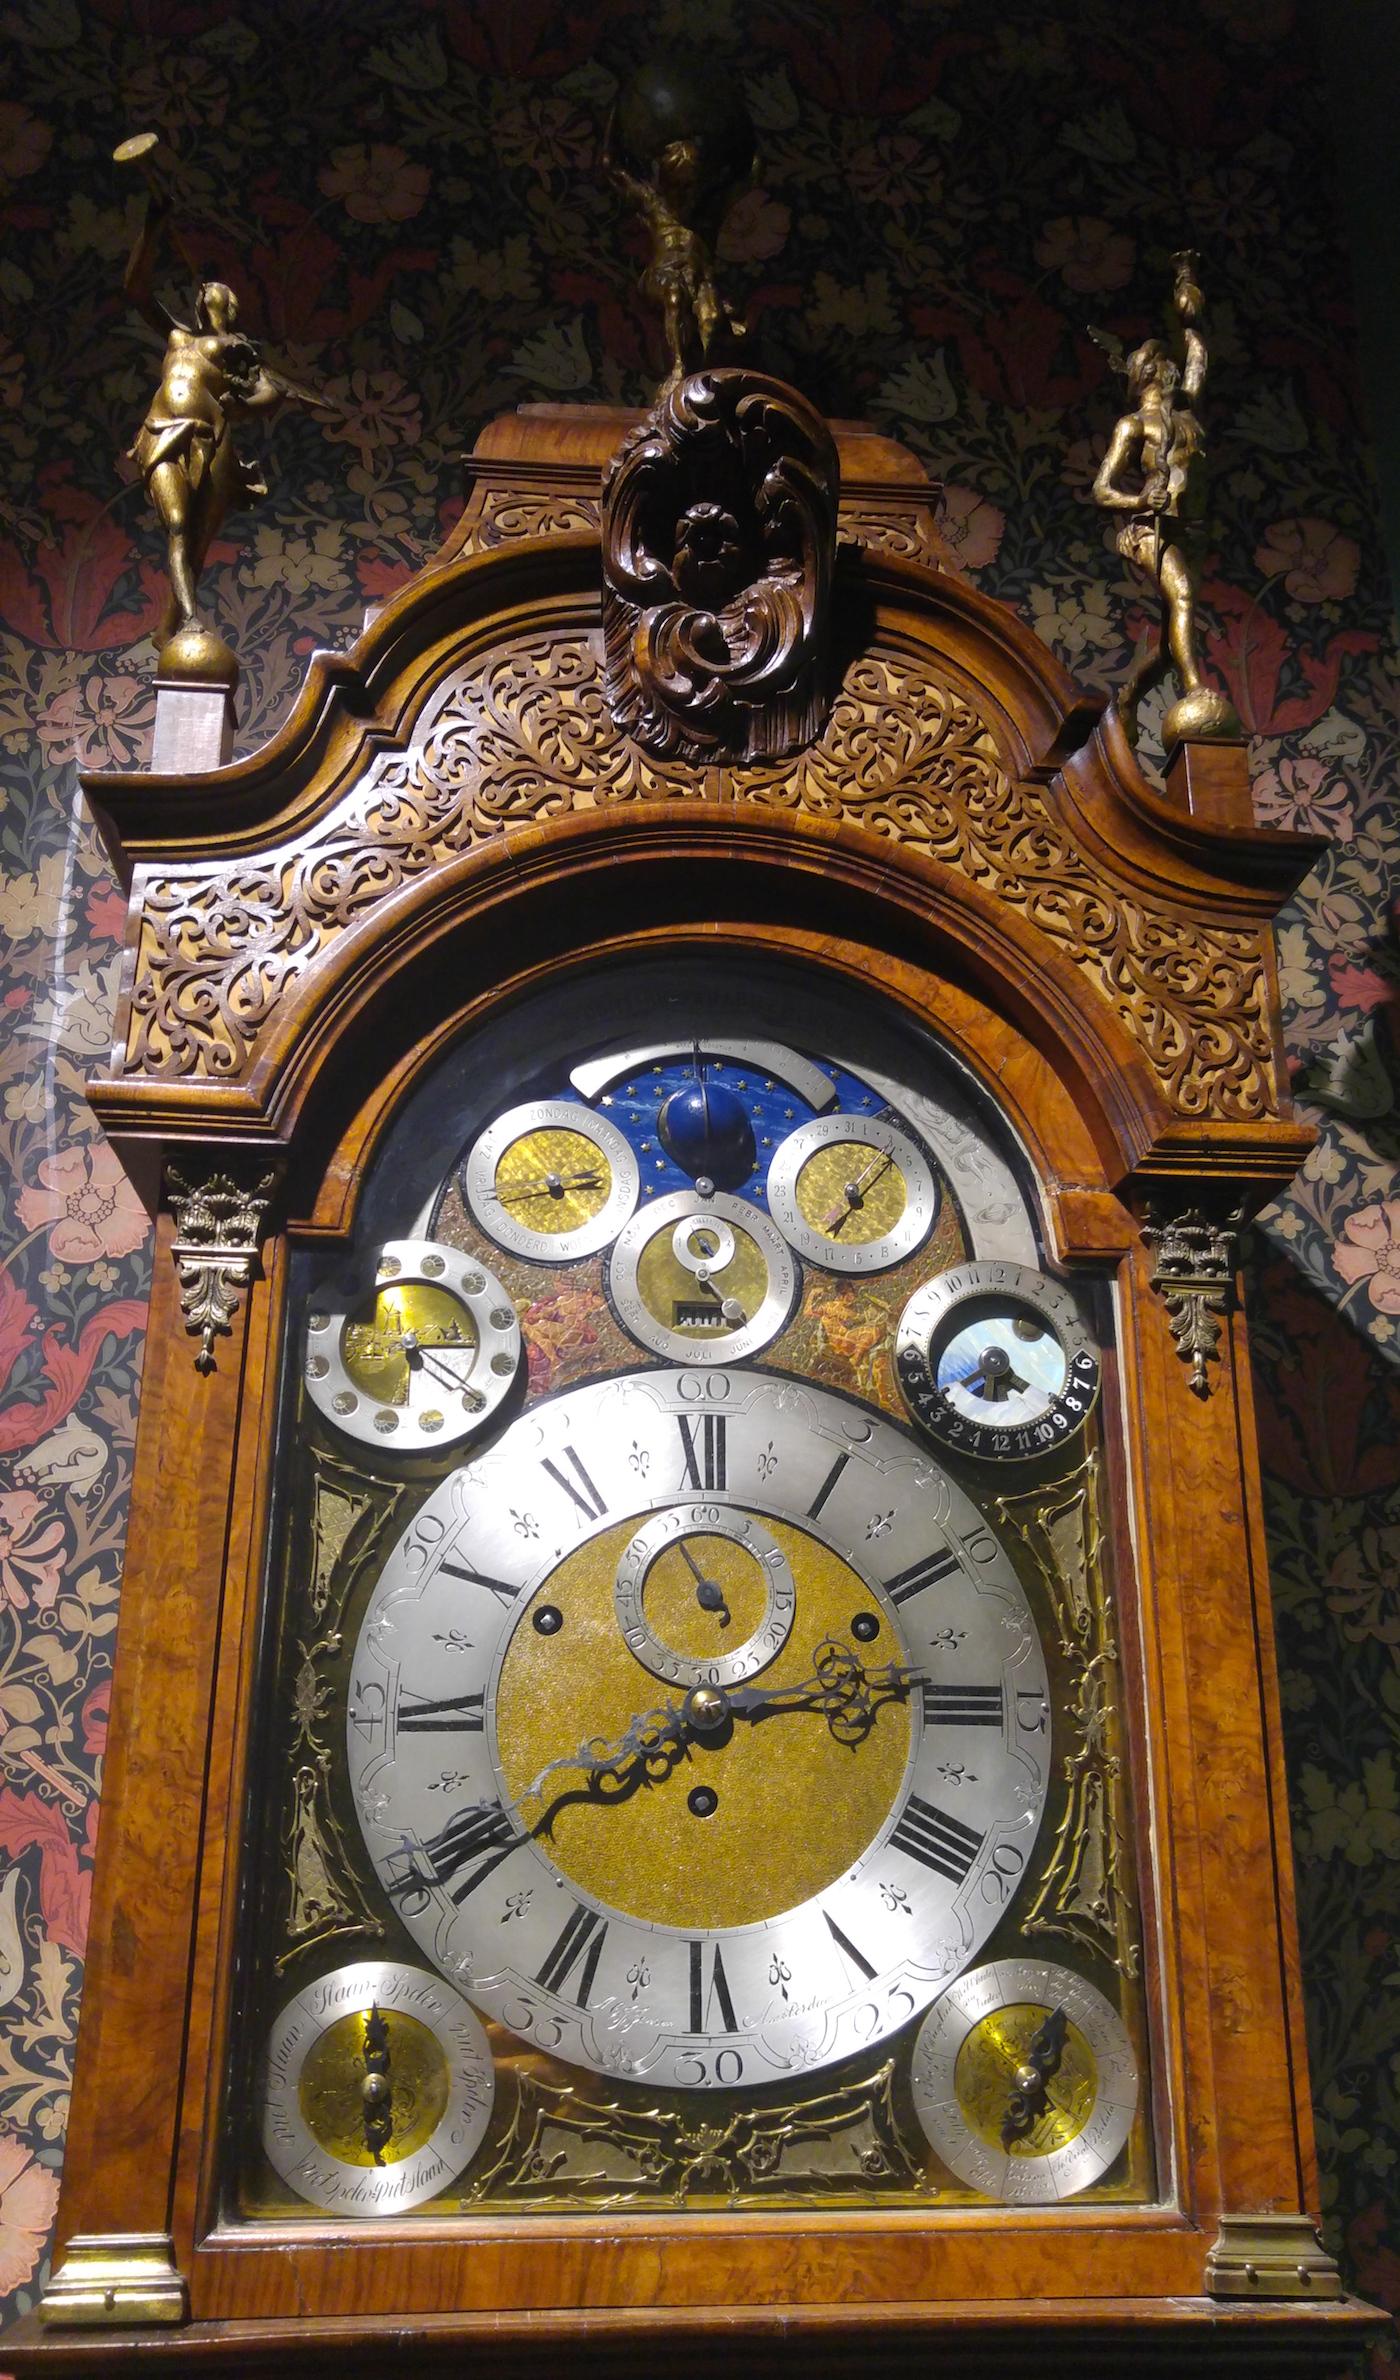 Standing clock by A.C.J. Jansen, Amsterdam (ca 1890)